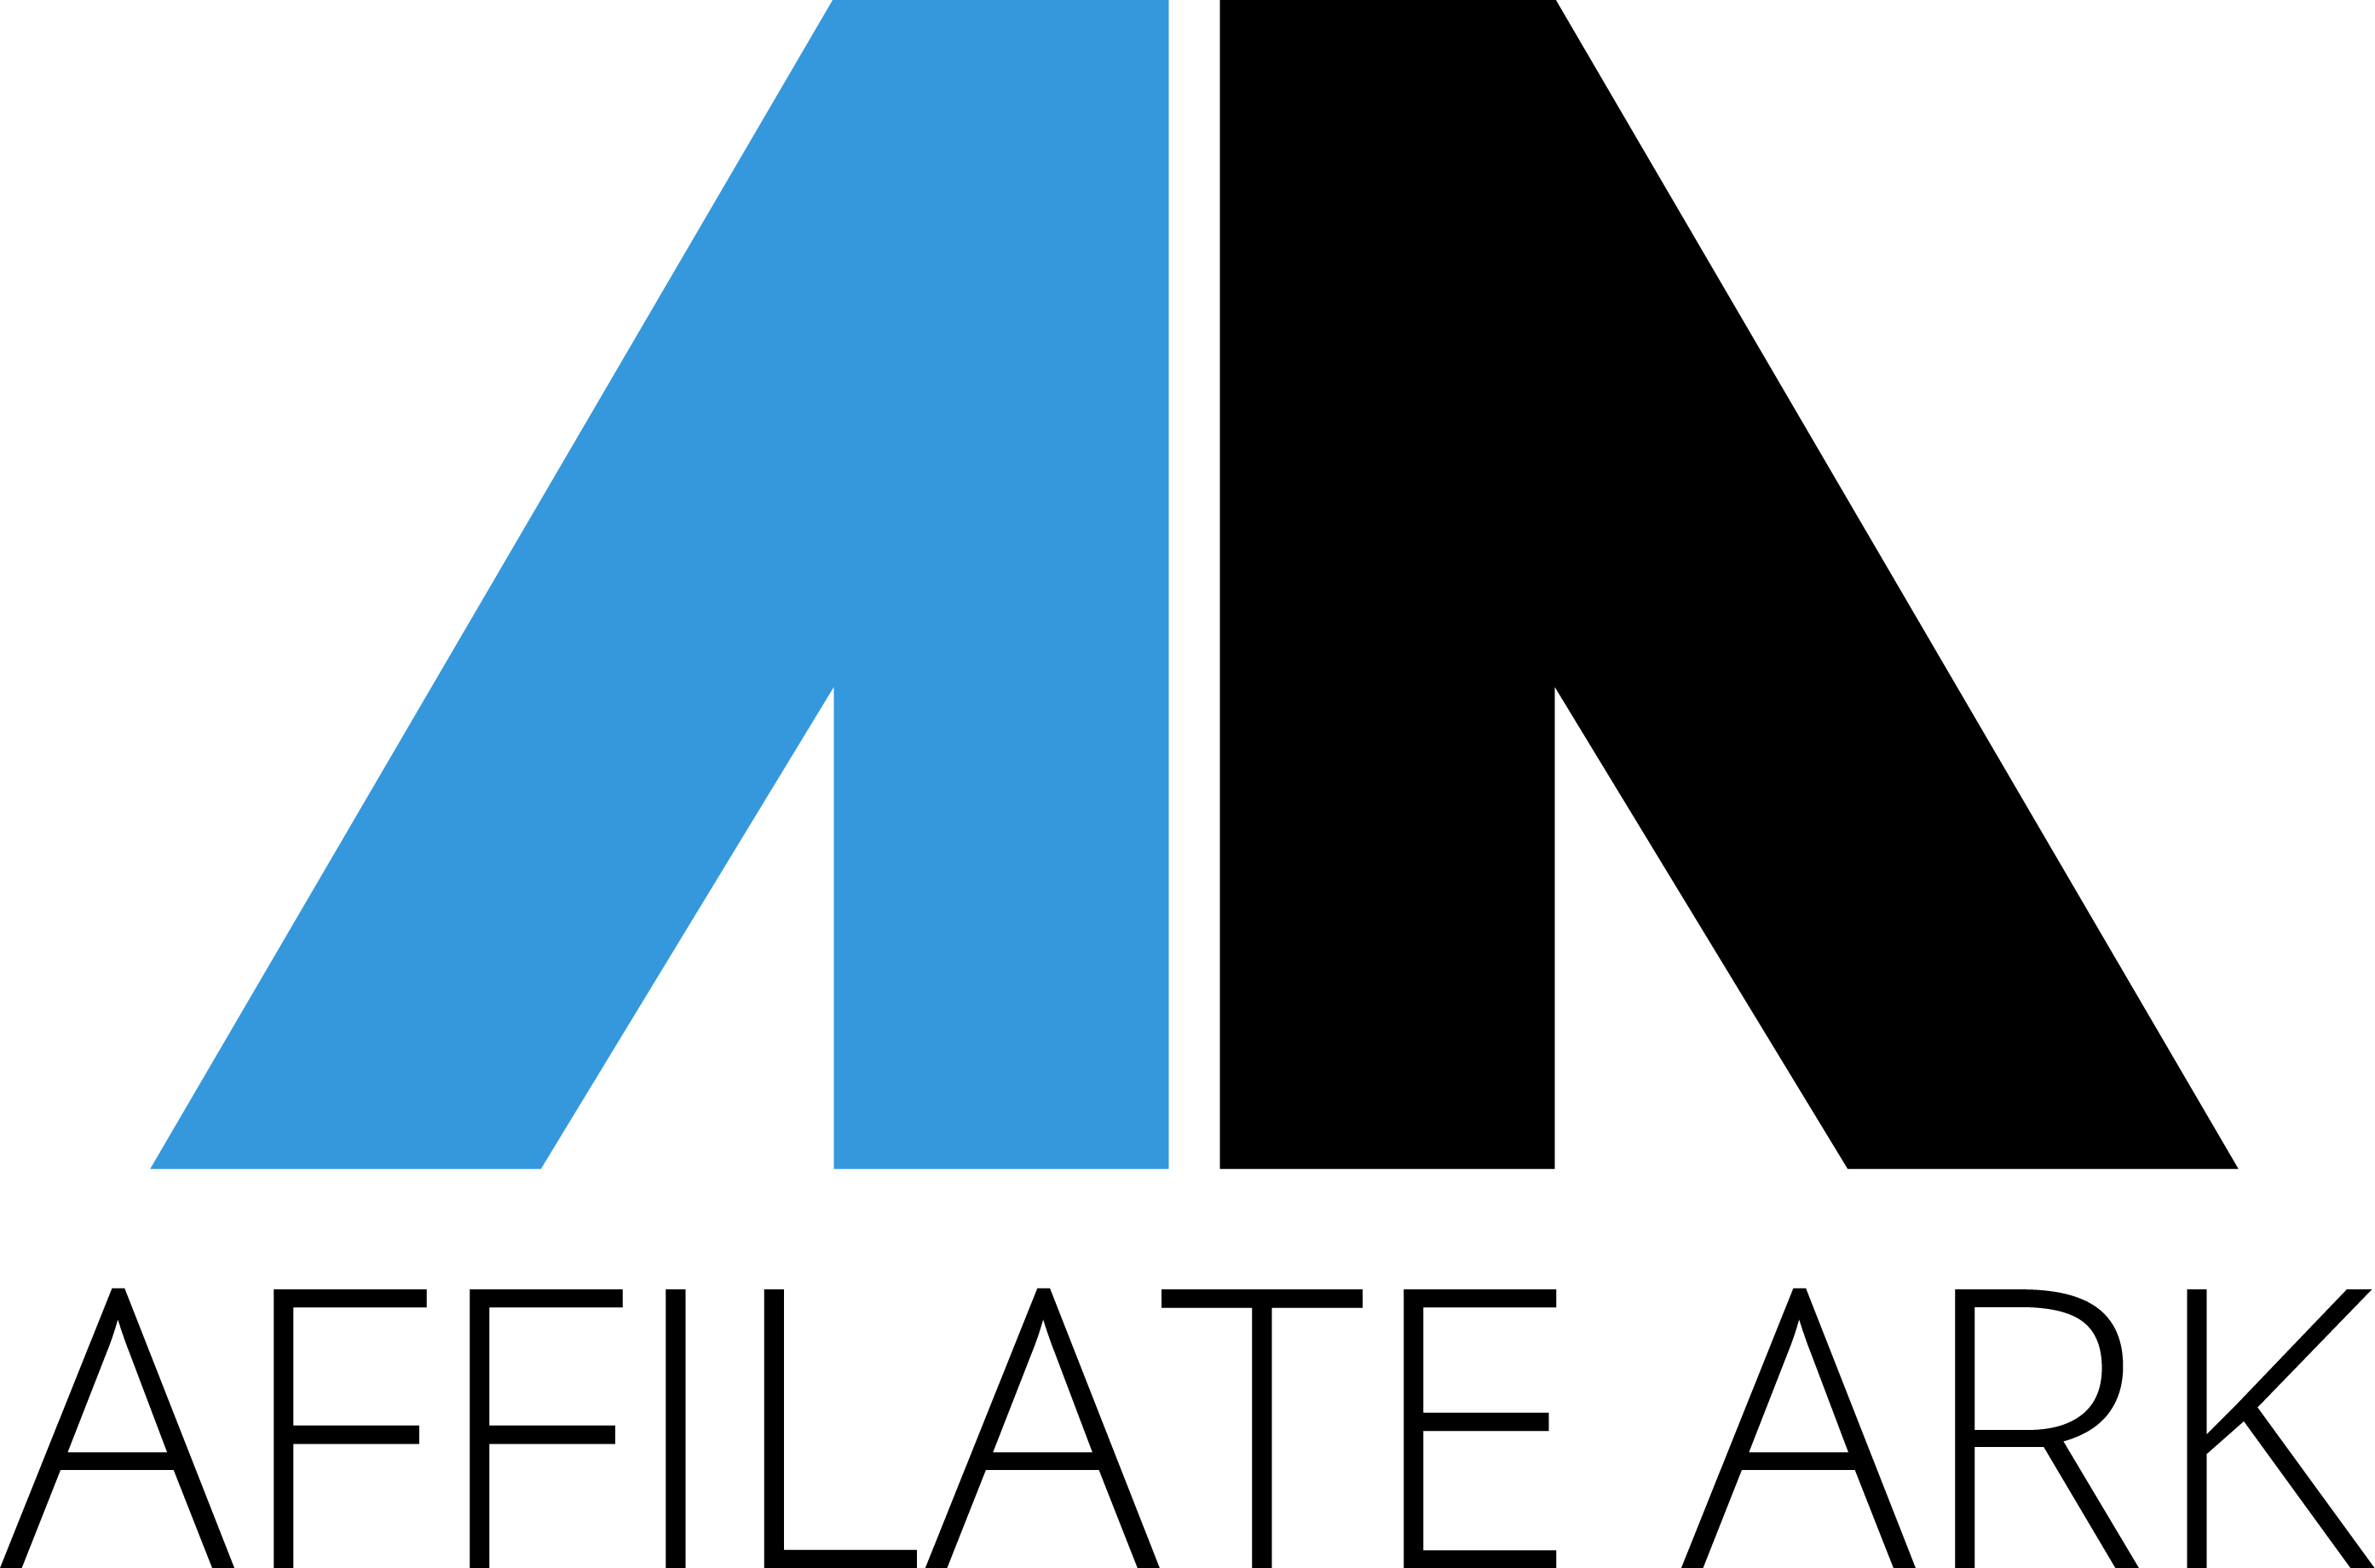 affiliateark.com